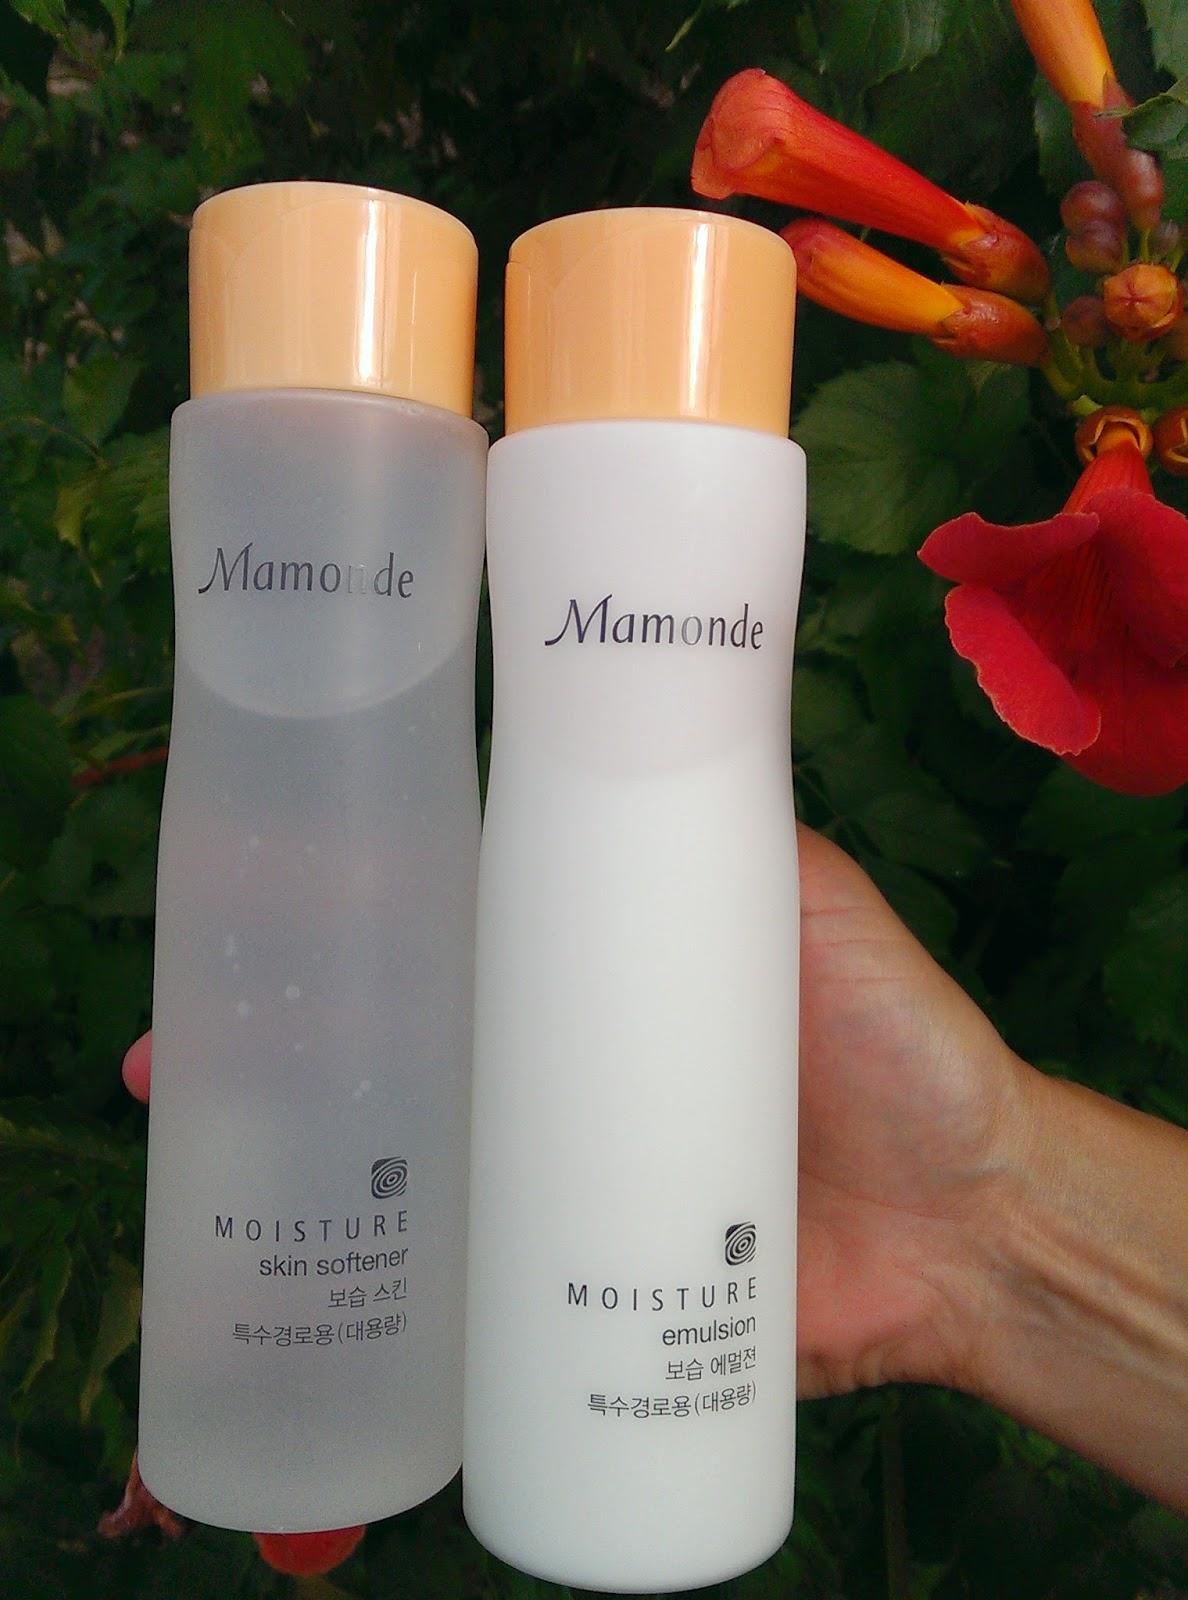 Mamonde Moisture Skin Softener и Mamonde Moisture Emulsion